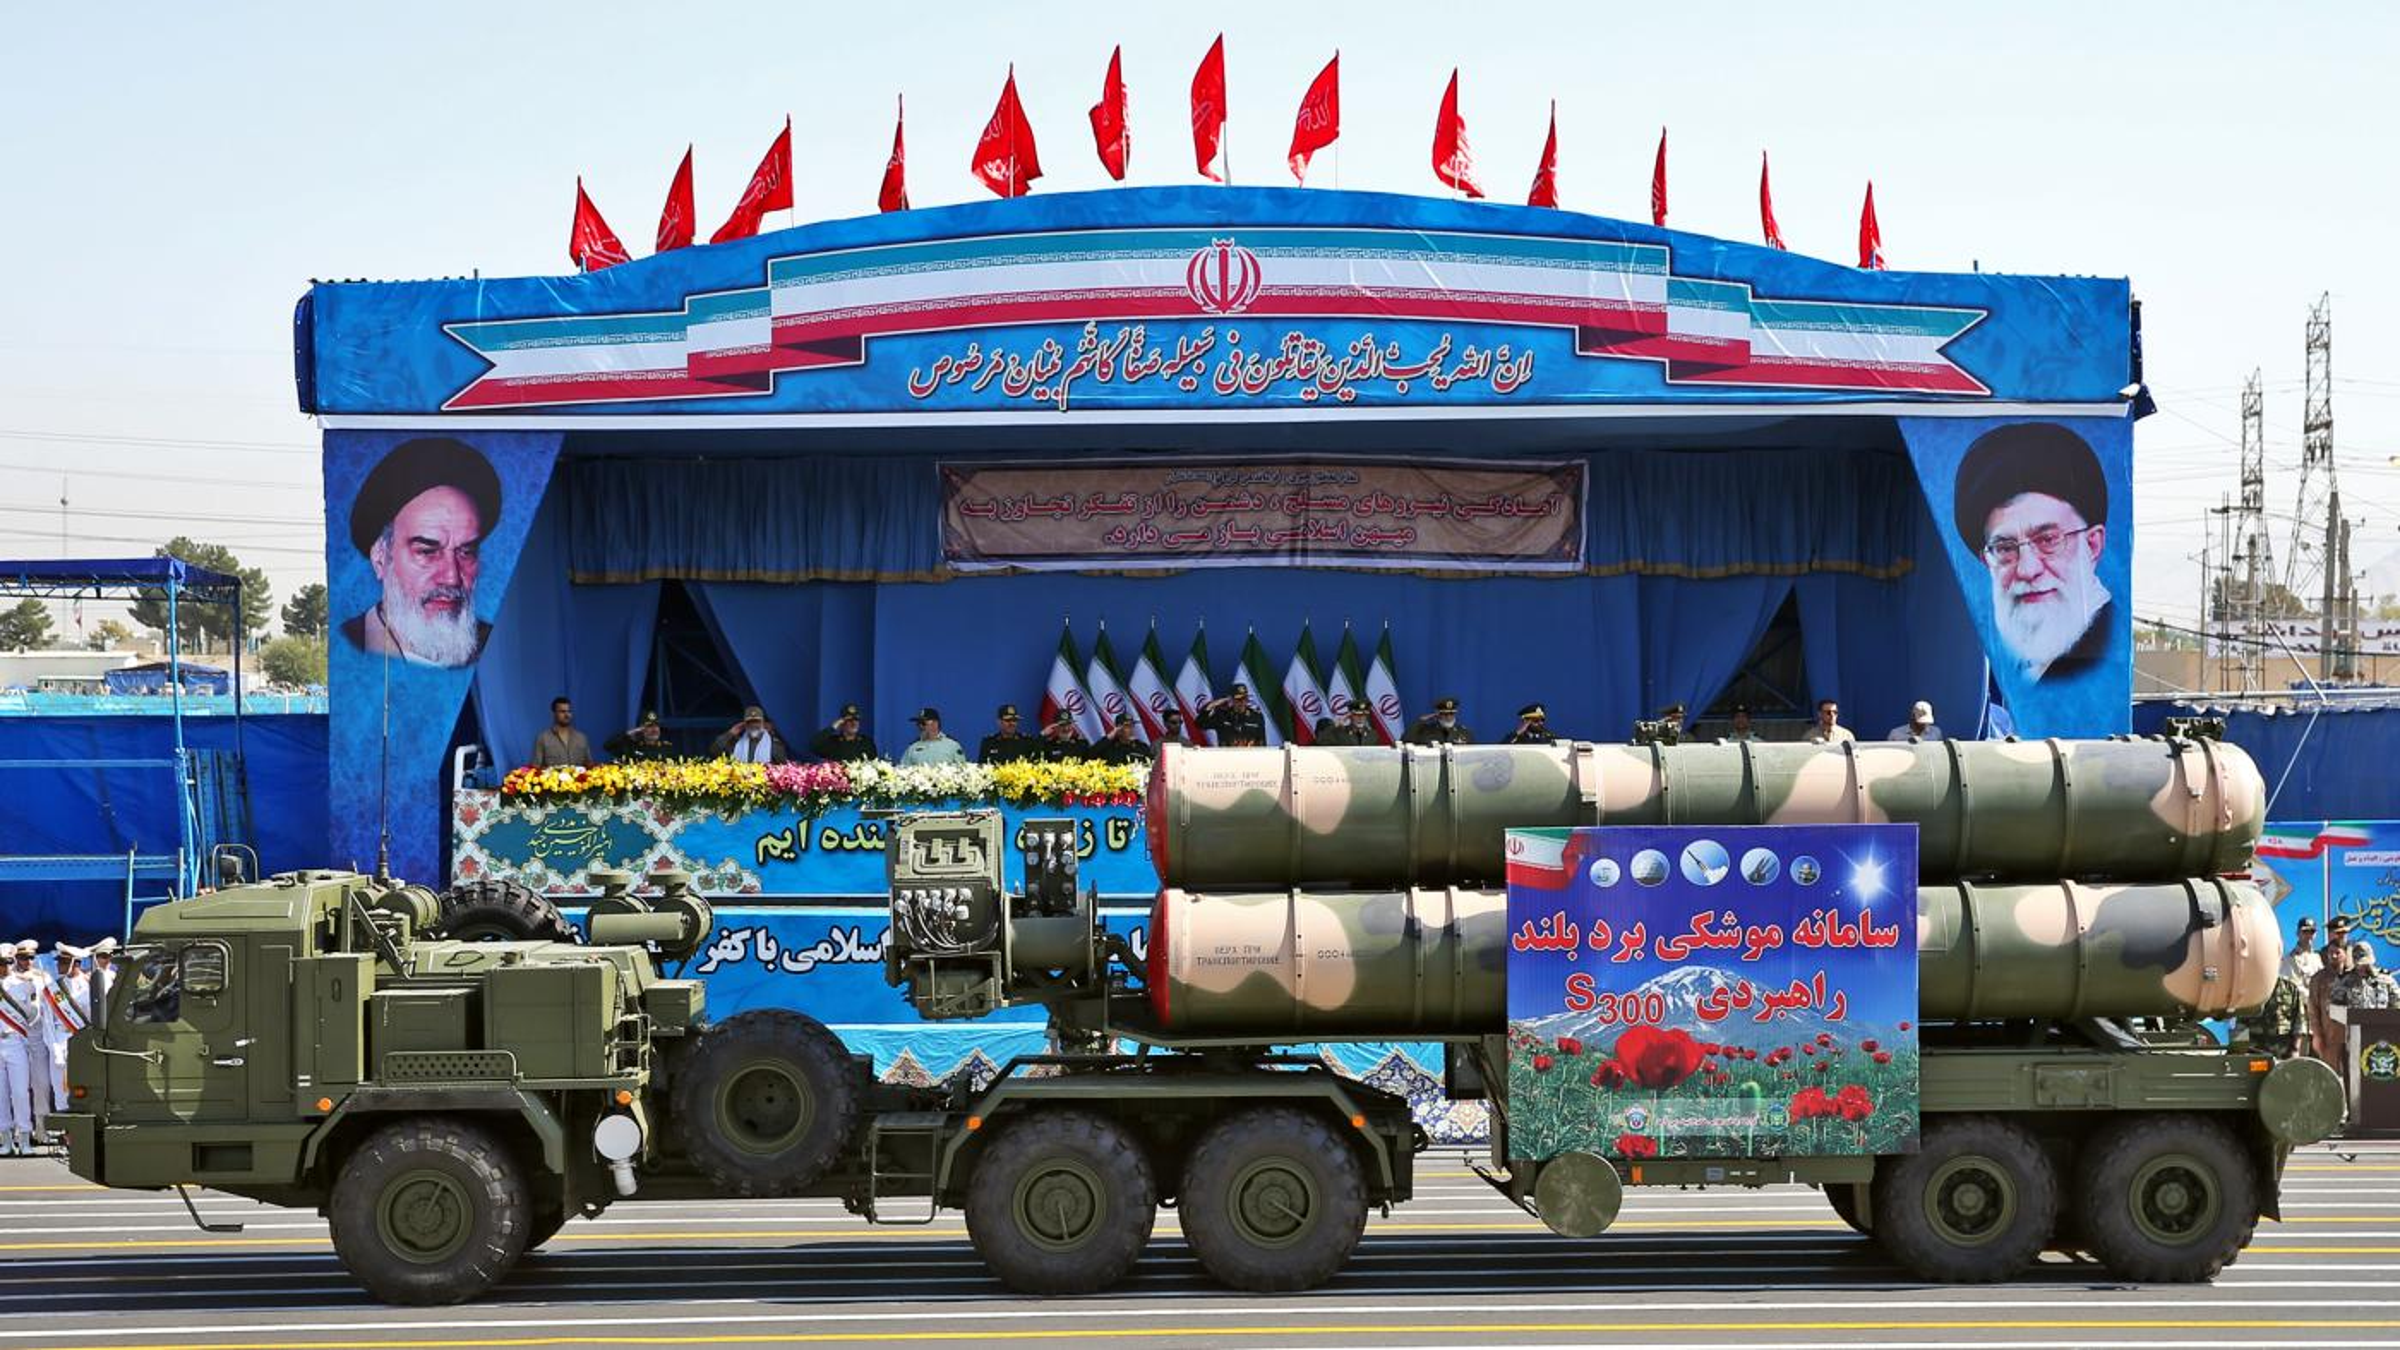 Satellite images show a missile launcher following Iran's Ayatollah Khamenei